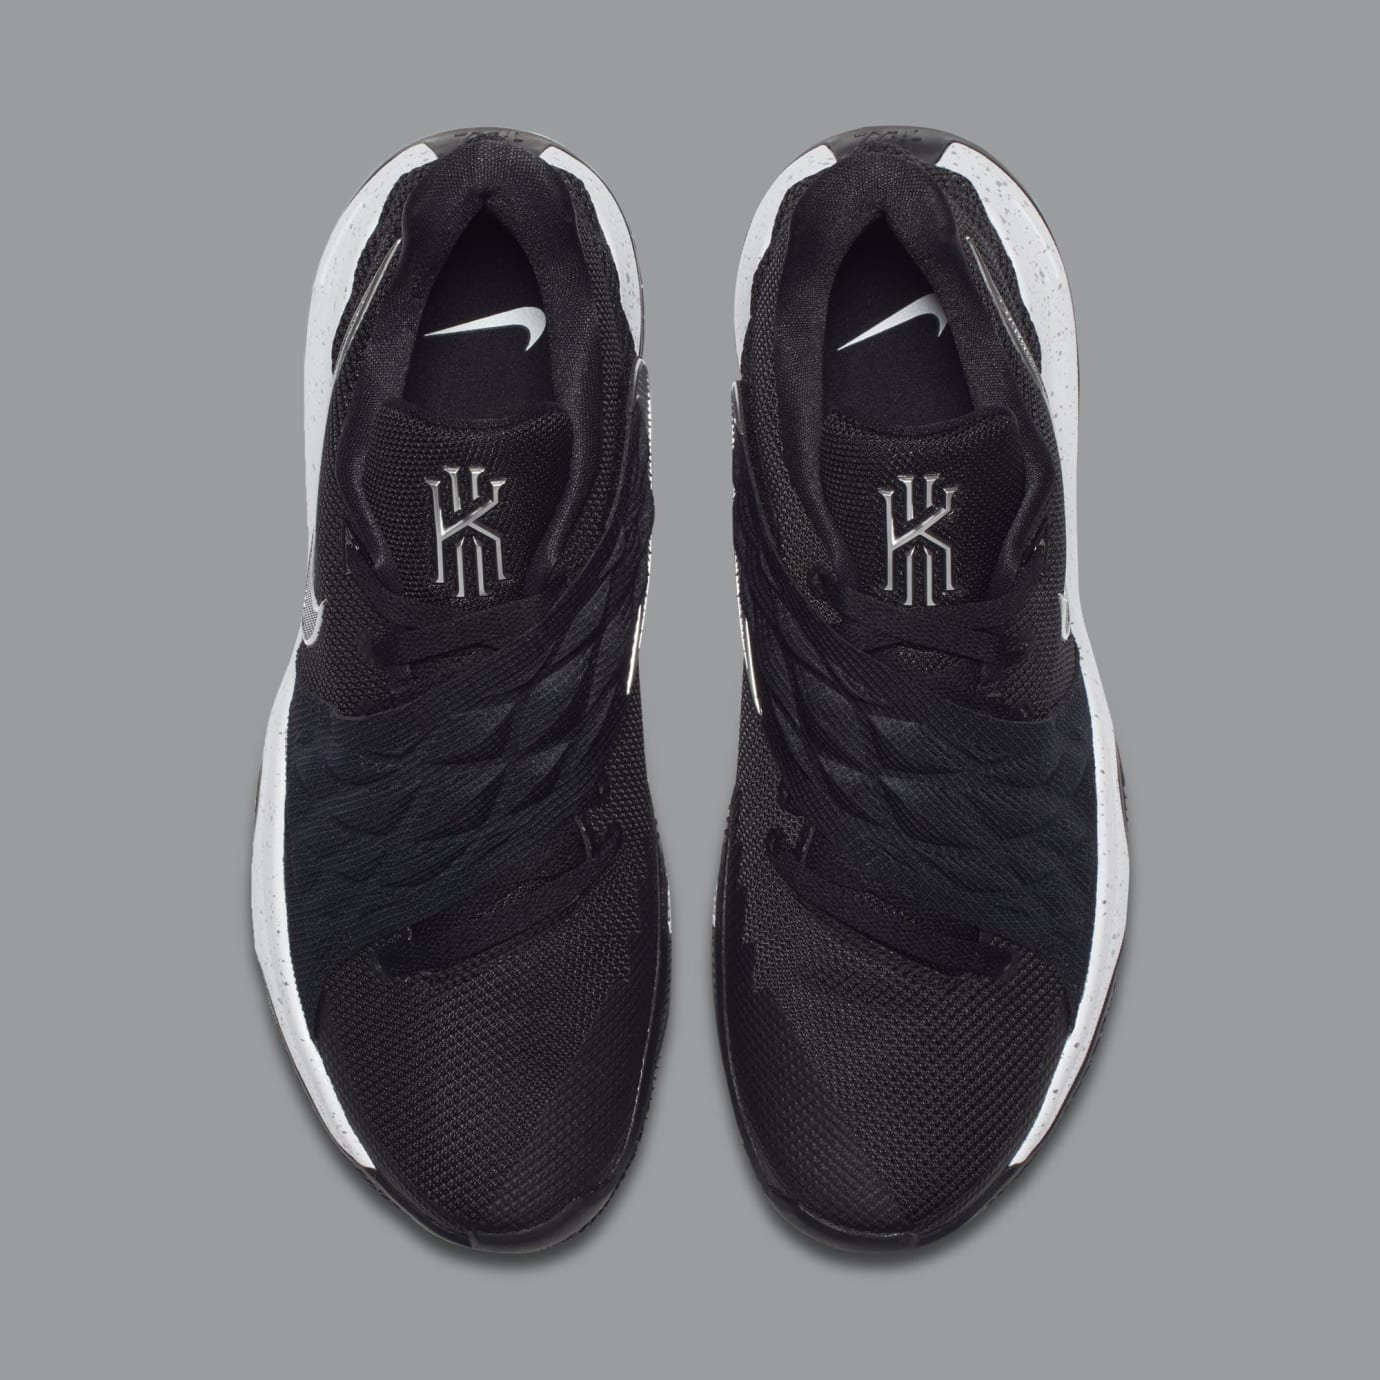 Nike Kyrie 4 Low 'Black/Metallic Silver' AO8979-003 (Top)